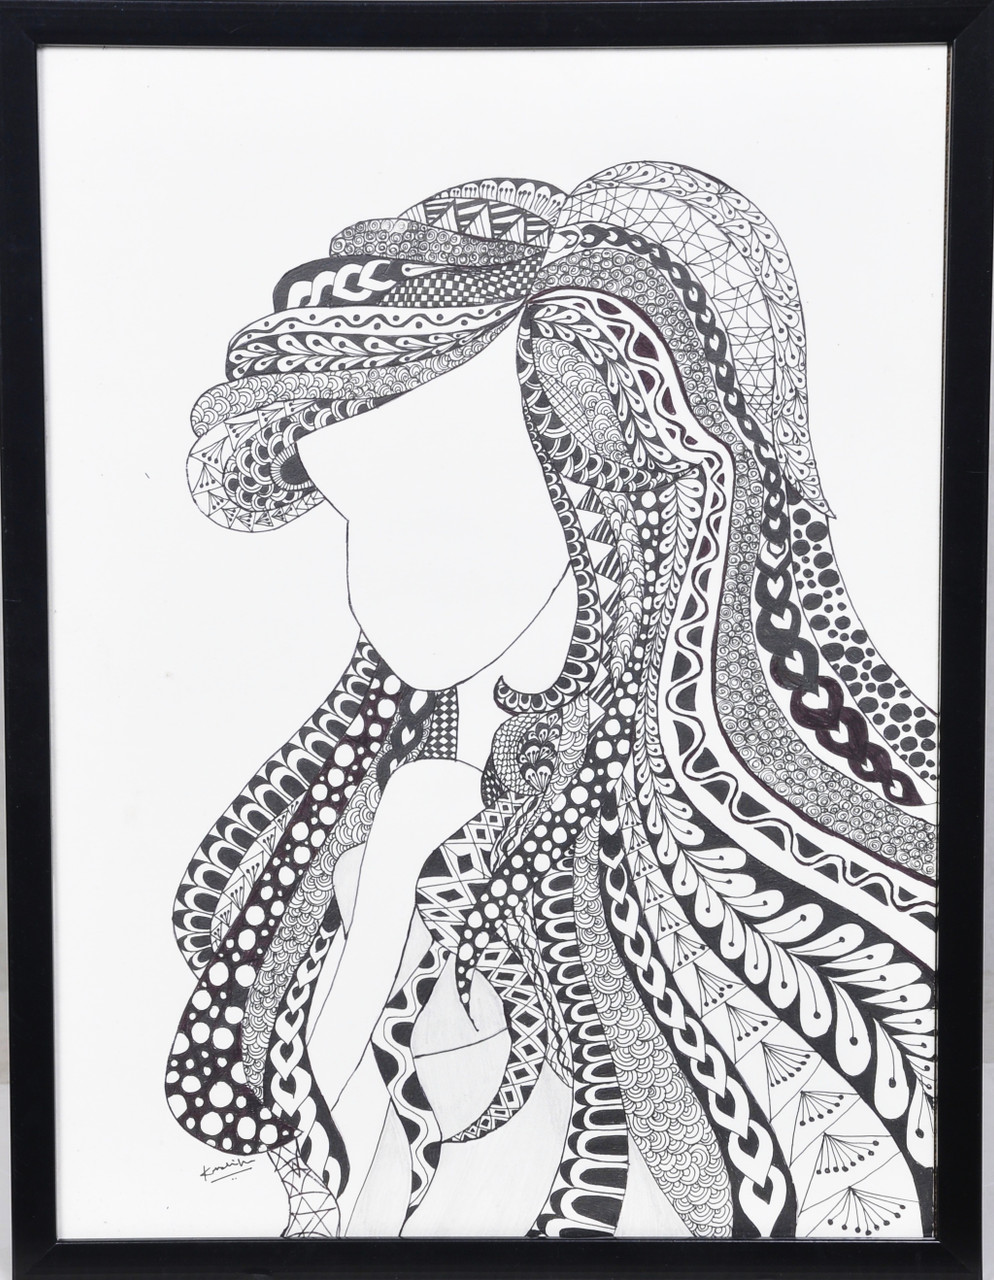 Buy Zentangle Angel Handmade Artwork Handmade Painting By Krushika Mehta Code Art 6833 39637 Paintings For Sale Online In India